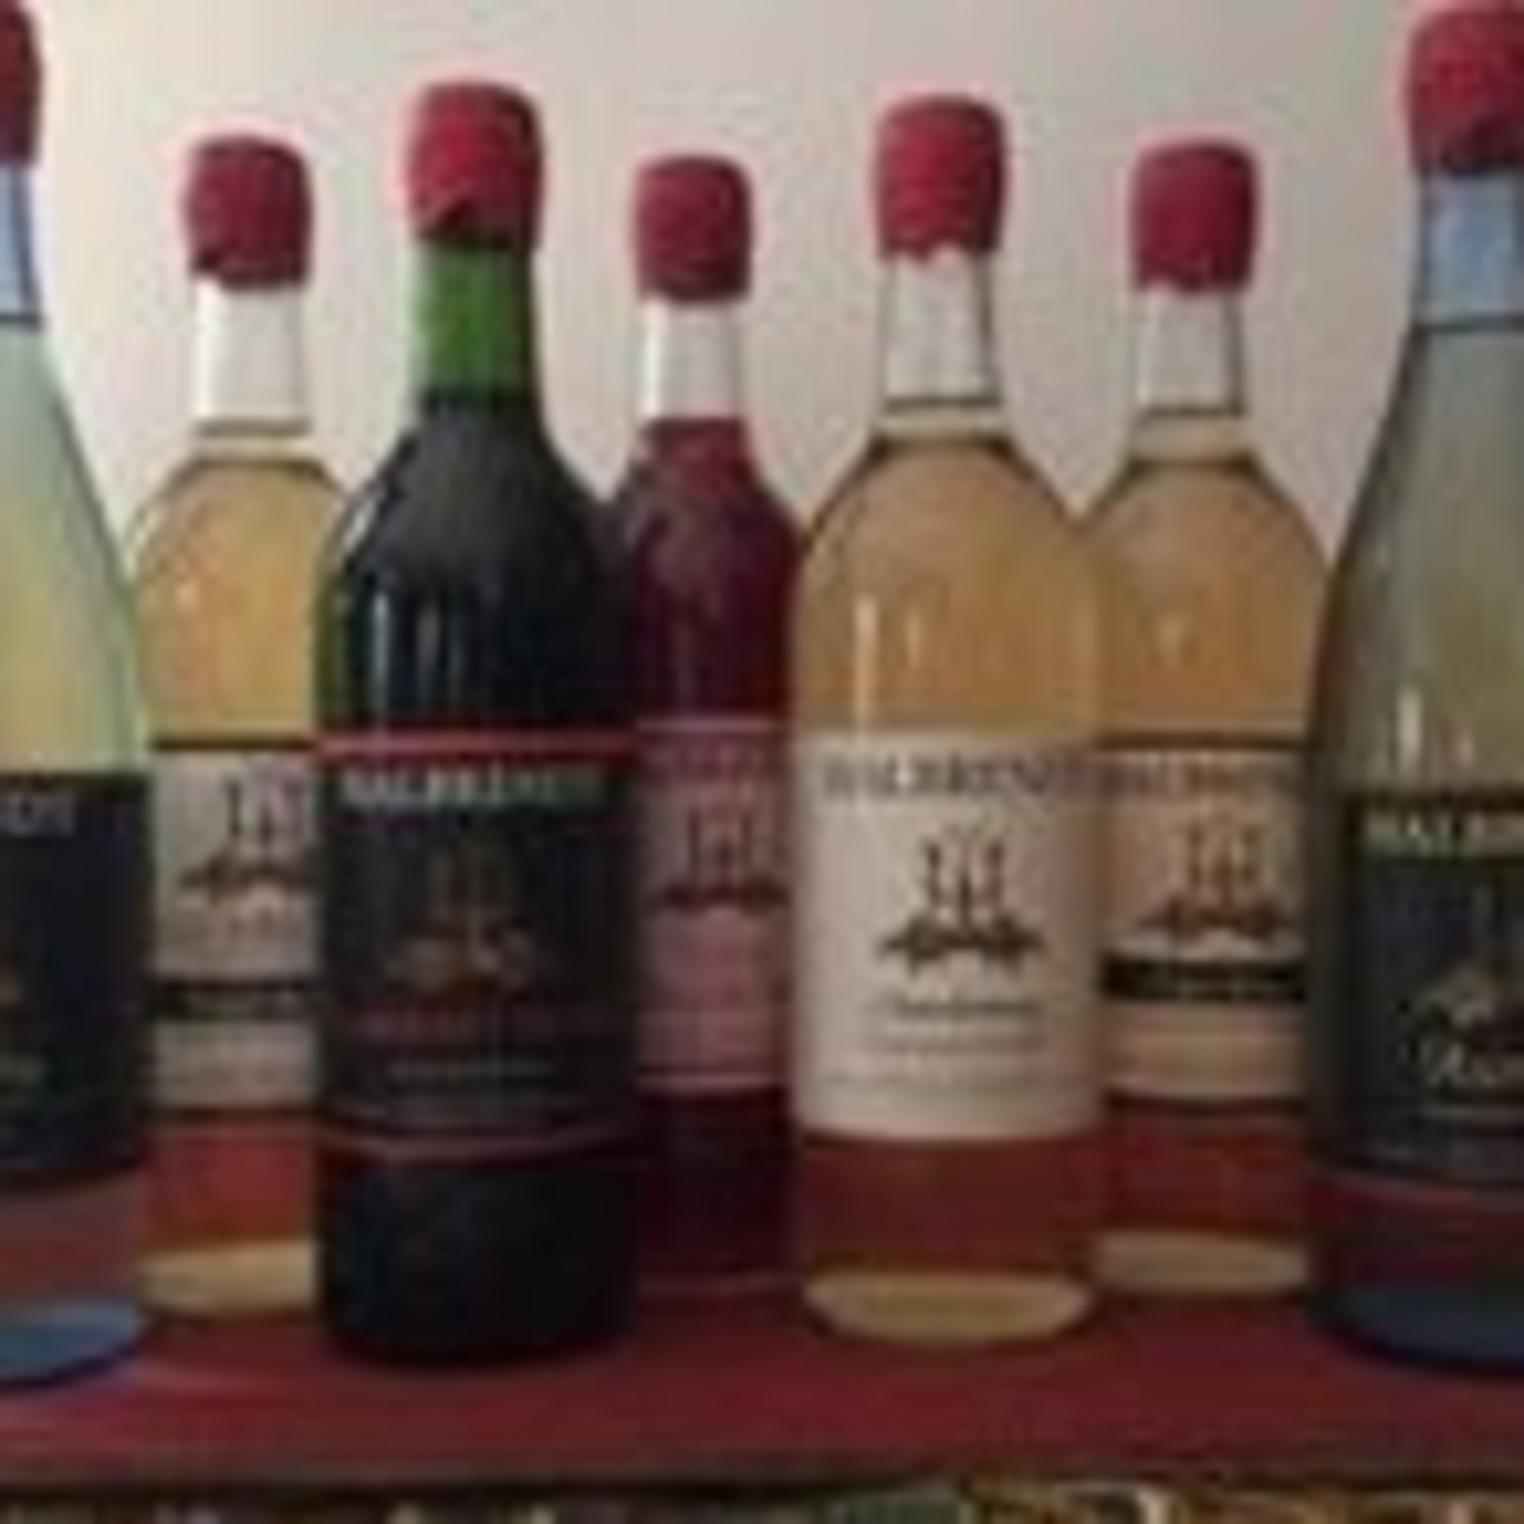 Halbrendt Vineyard & Winery